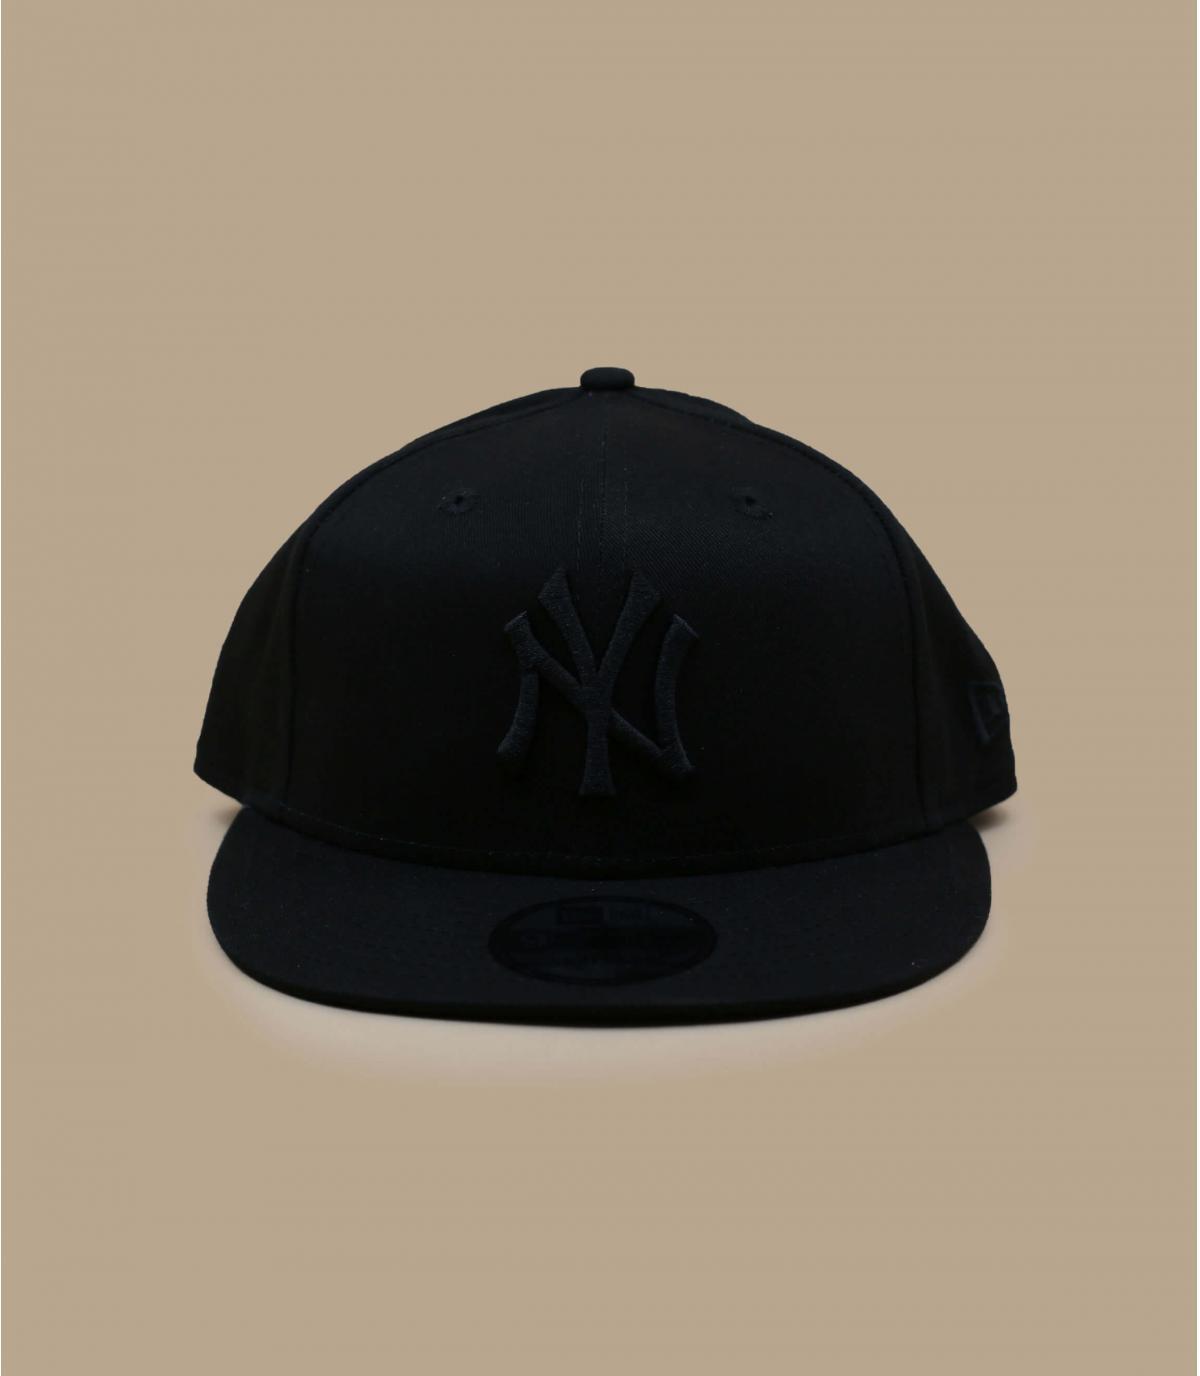 Details Snapback Cap NY MLB black black - Abbildung 2